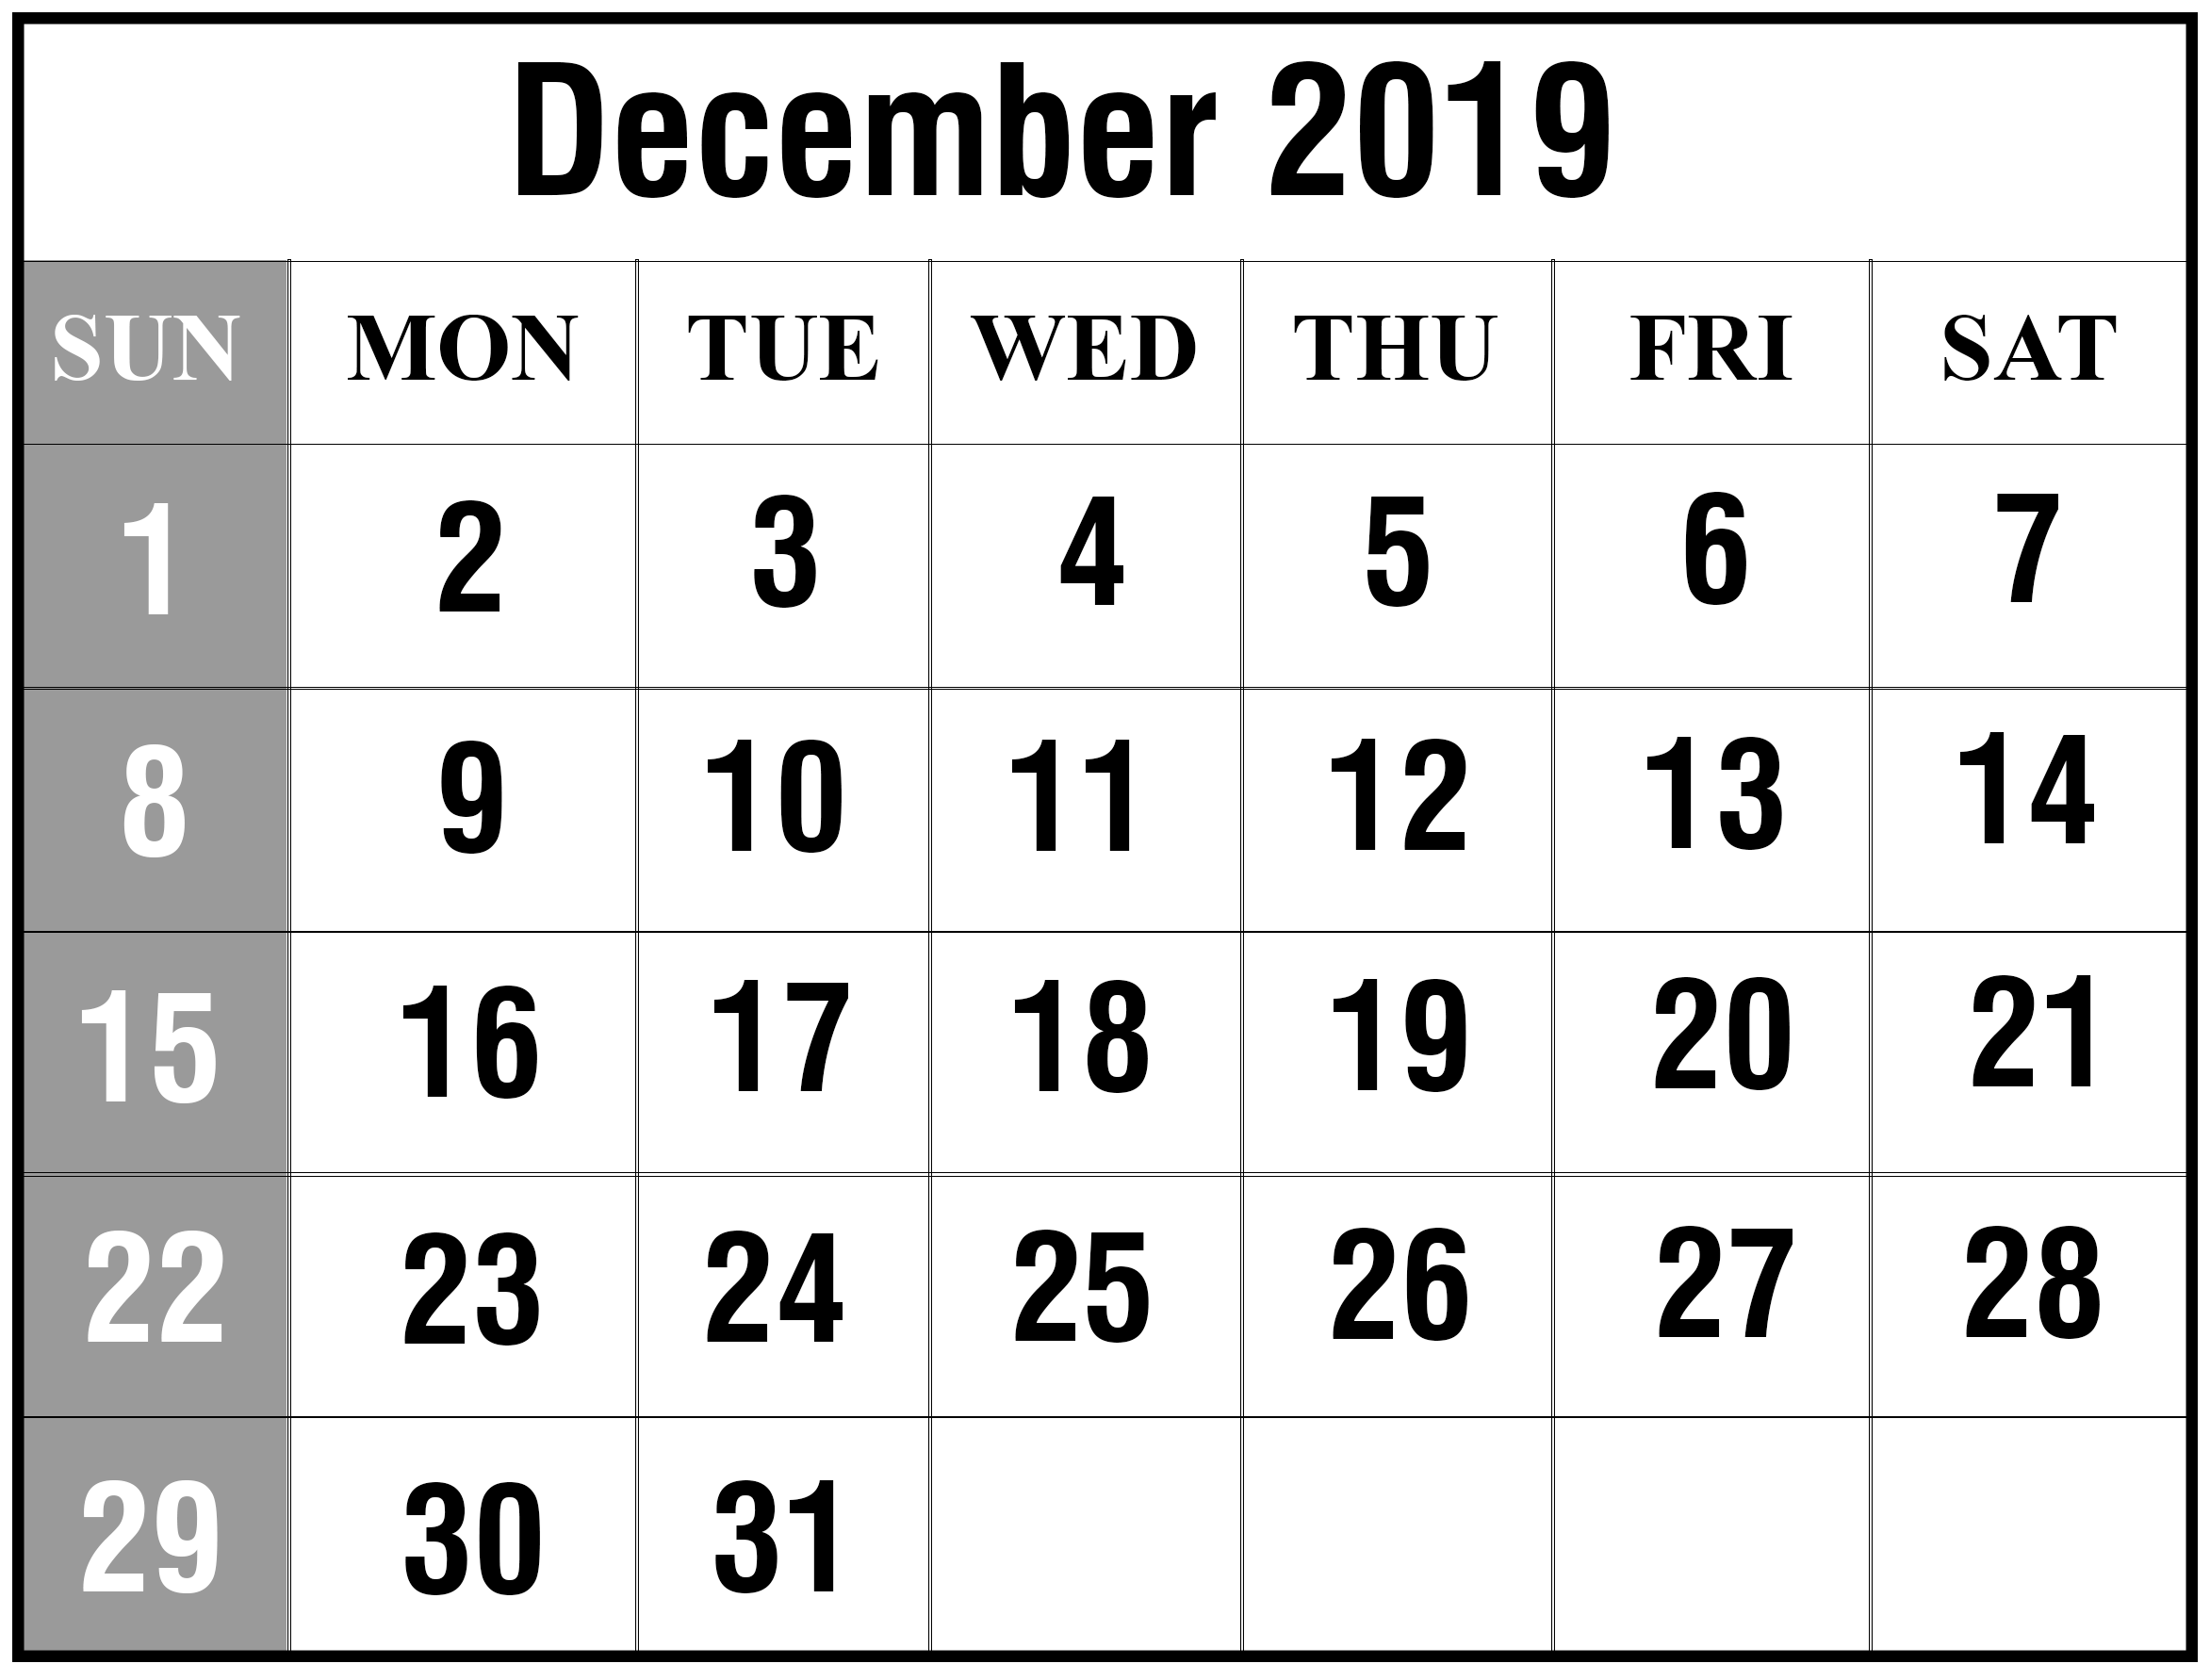 December 2019 Calendar Printable Dec December December2019 December2019calendar 20 Calendar 2019 Printable Calendar Printables Printable Calendar Template